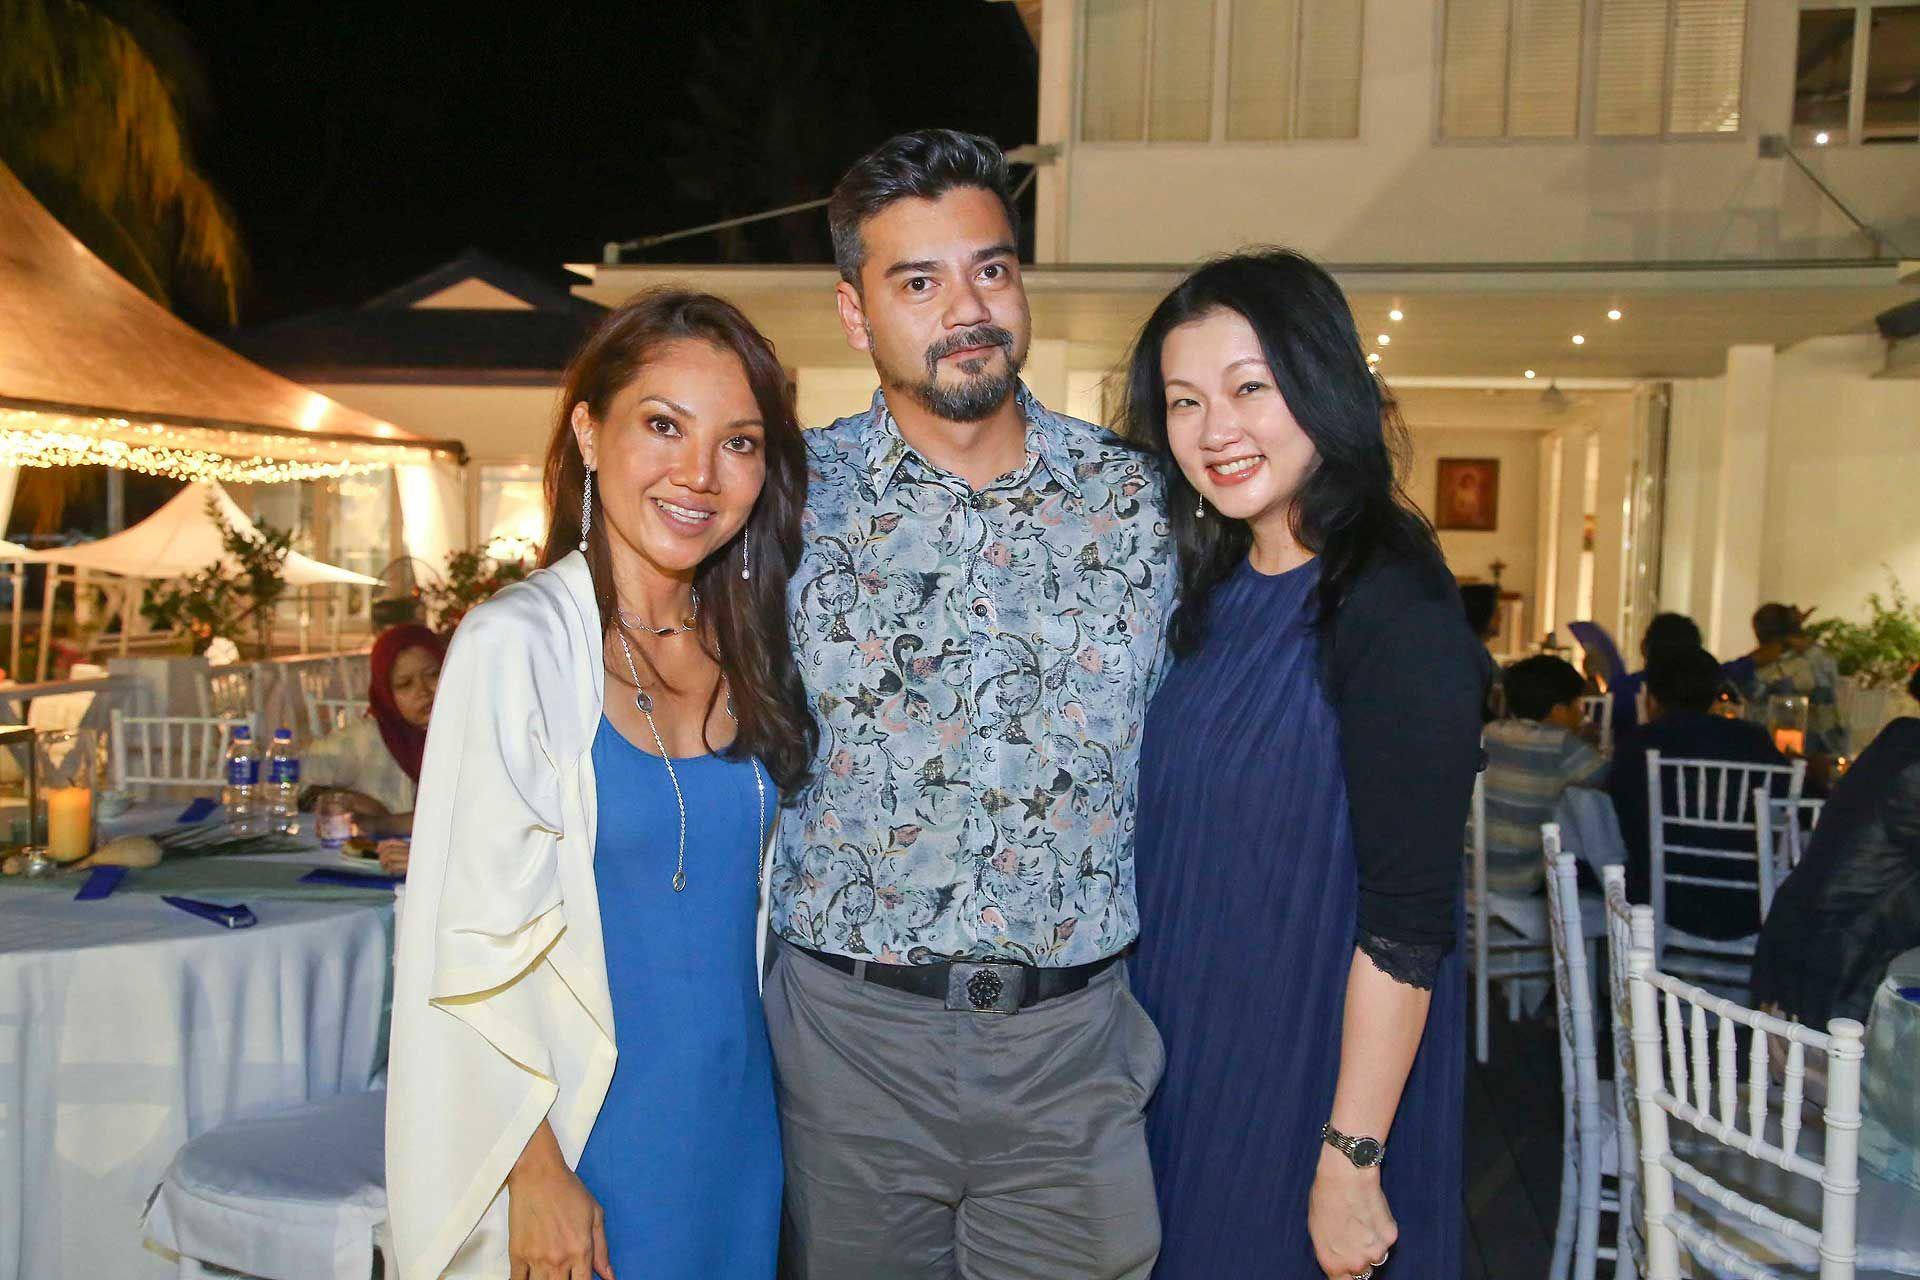 Nicola Tiong, Tunku Nasiruddin and Tuty Faezah